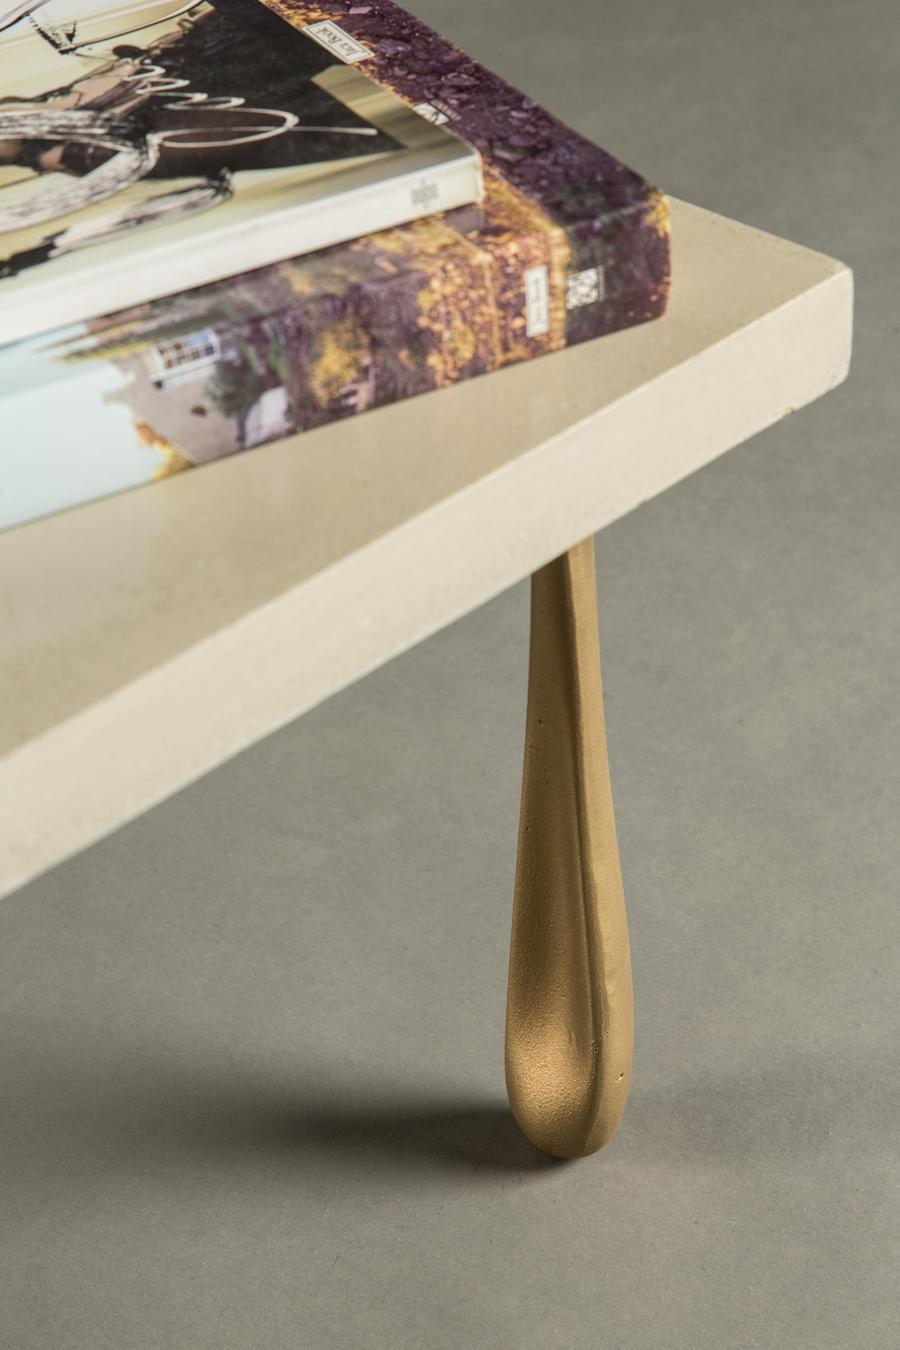 stacklab-design-custom-coffee-table-detail-studio.jpg